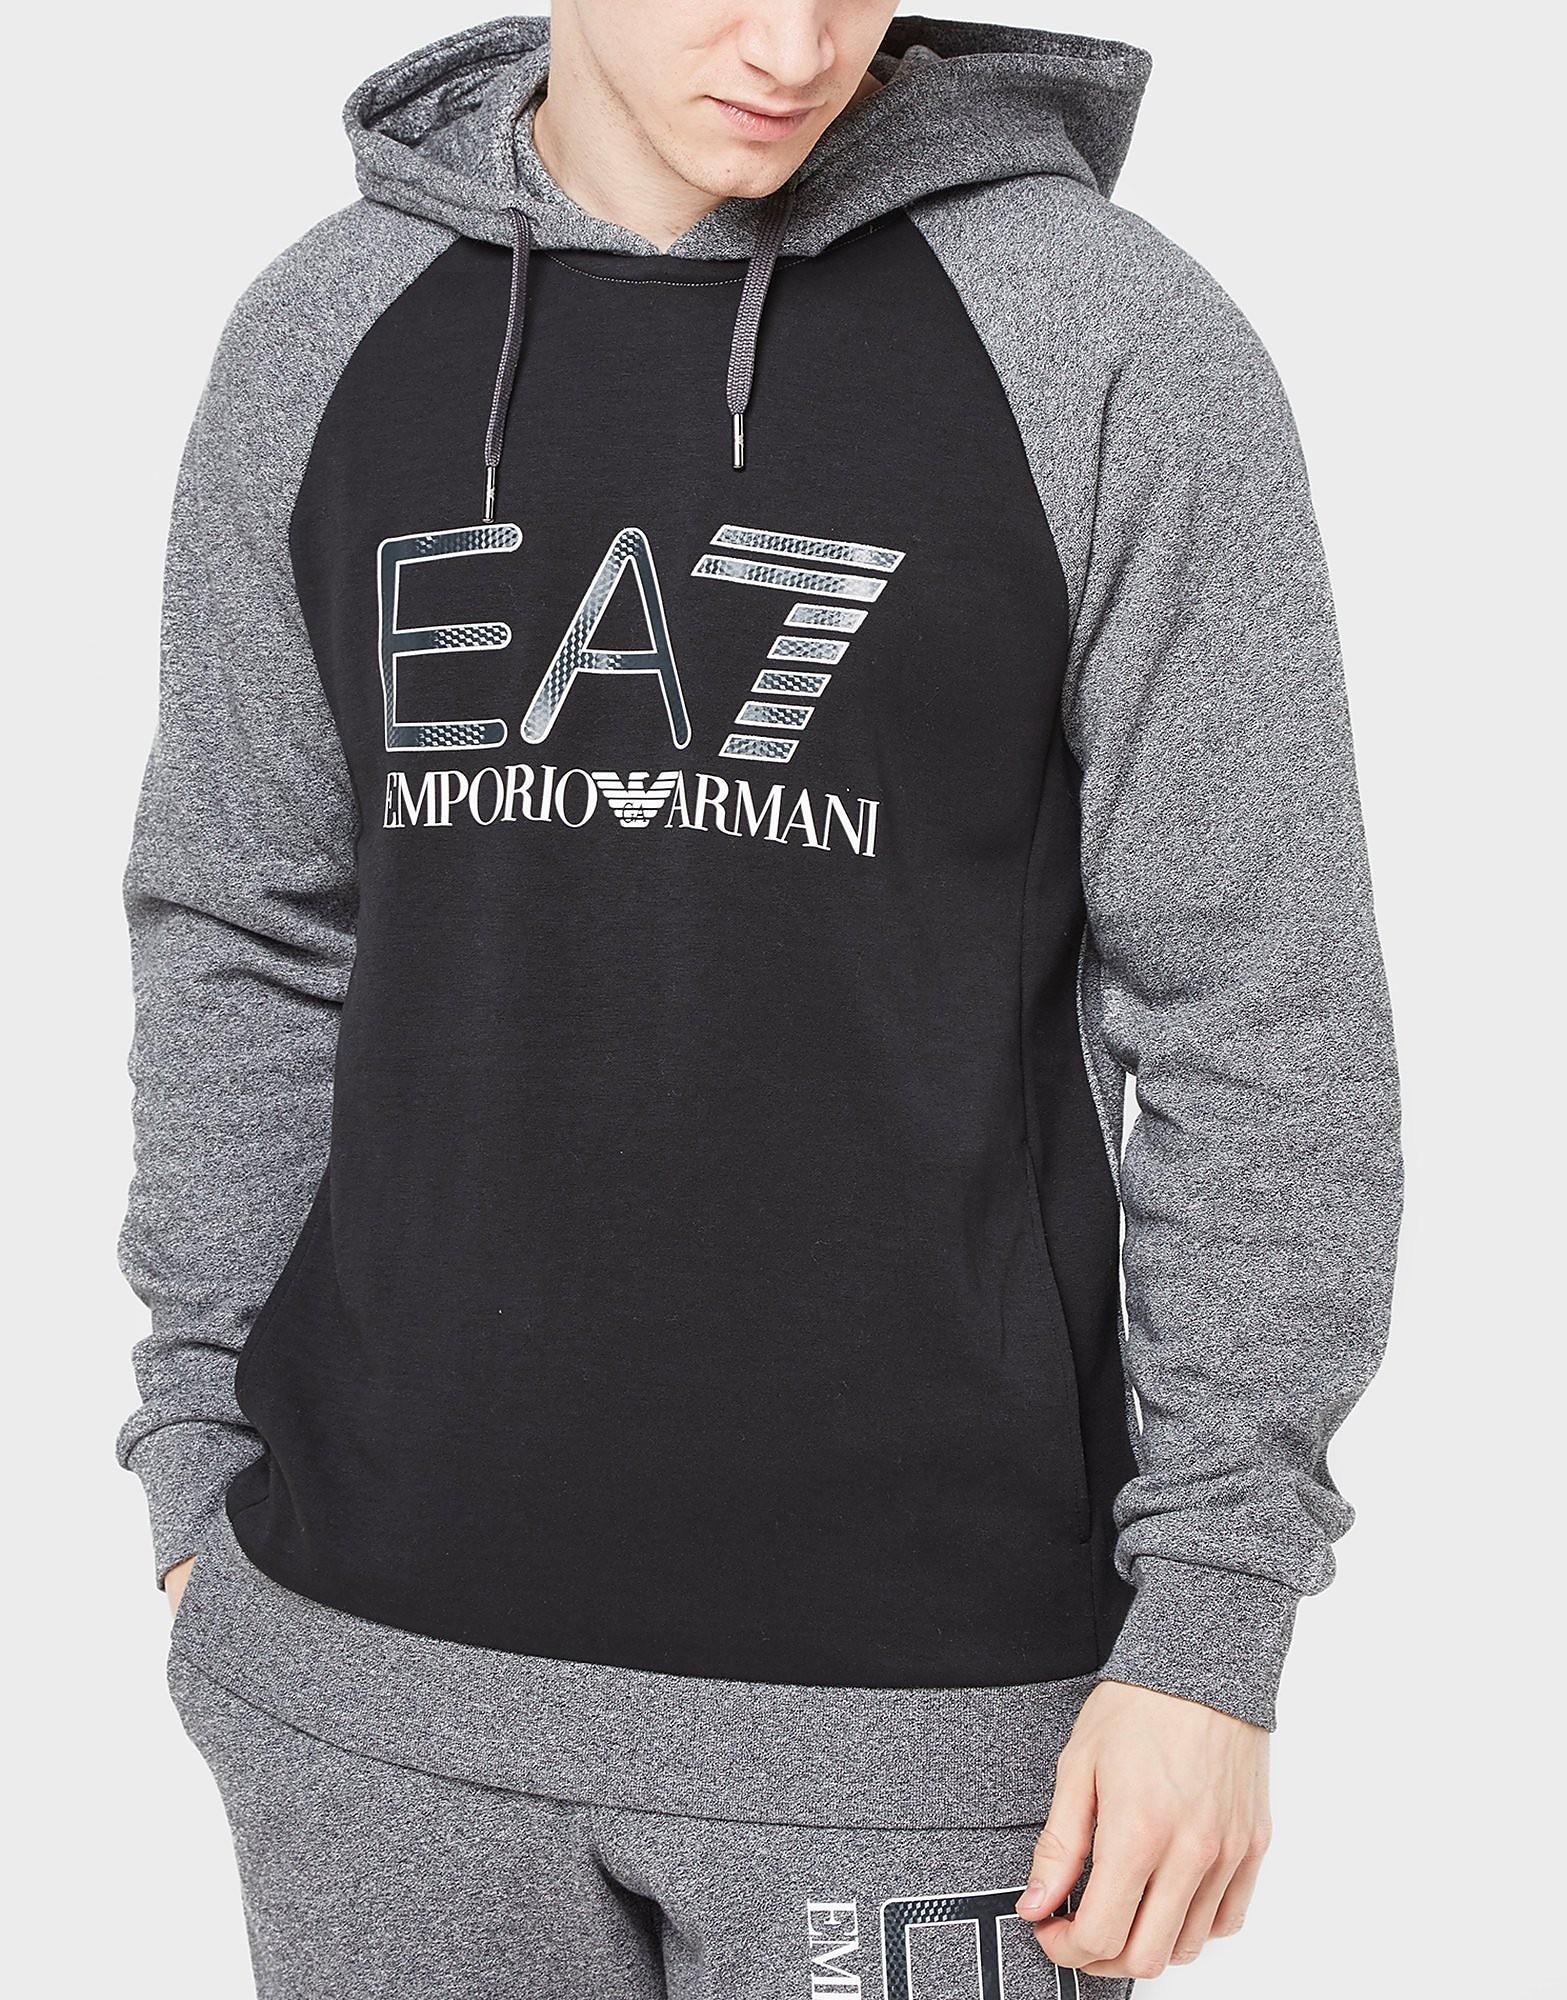 Emporio Armani EA7 Overhead Hoody